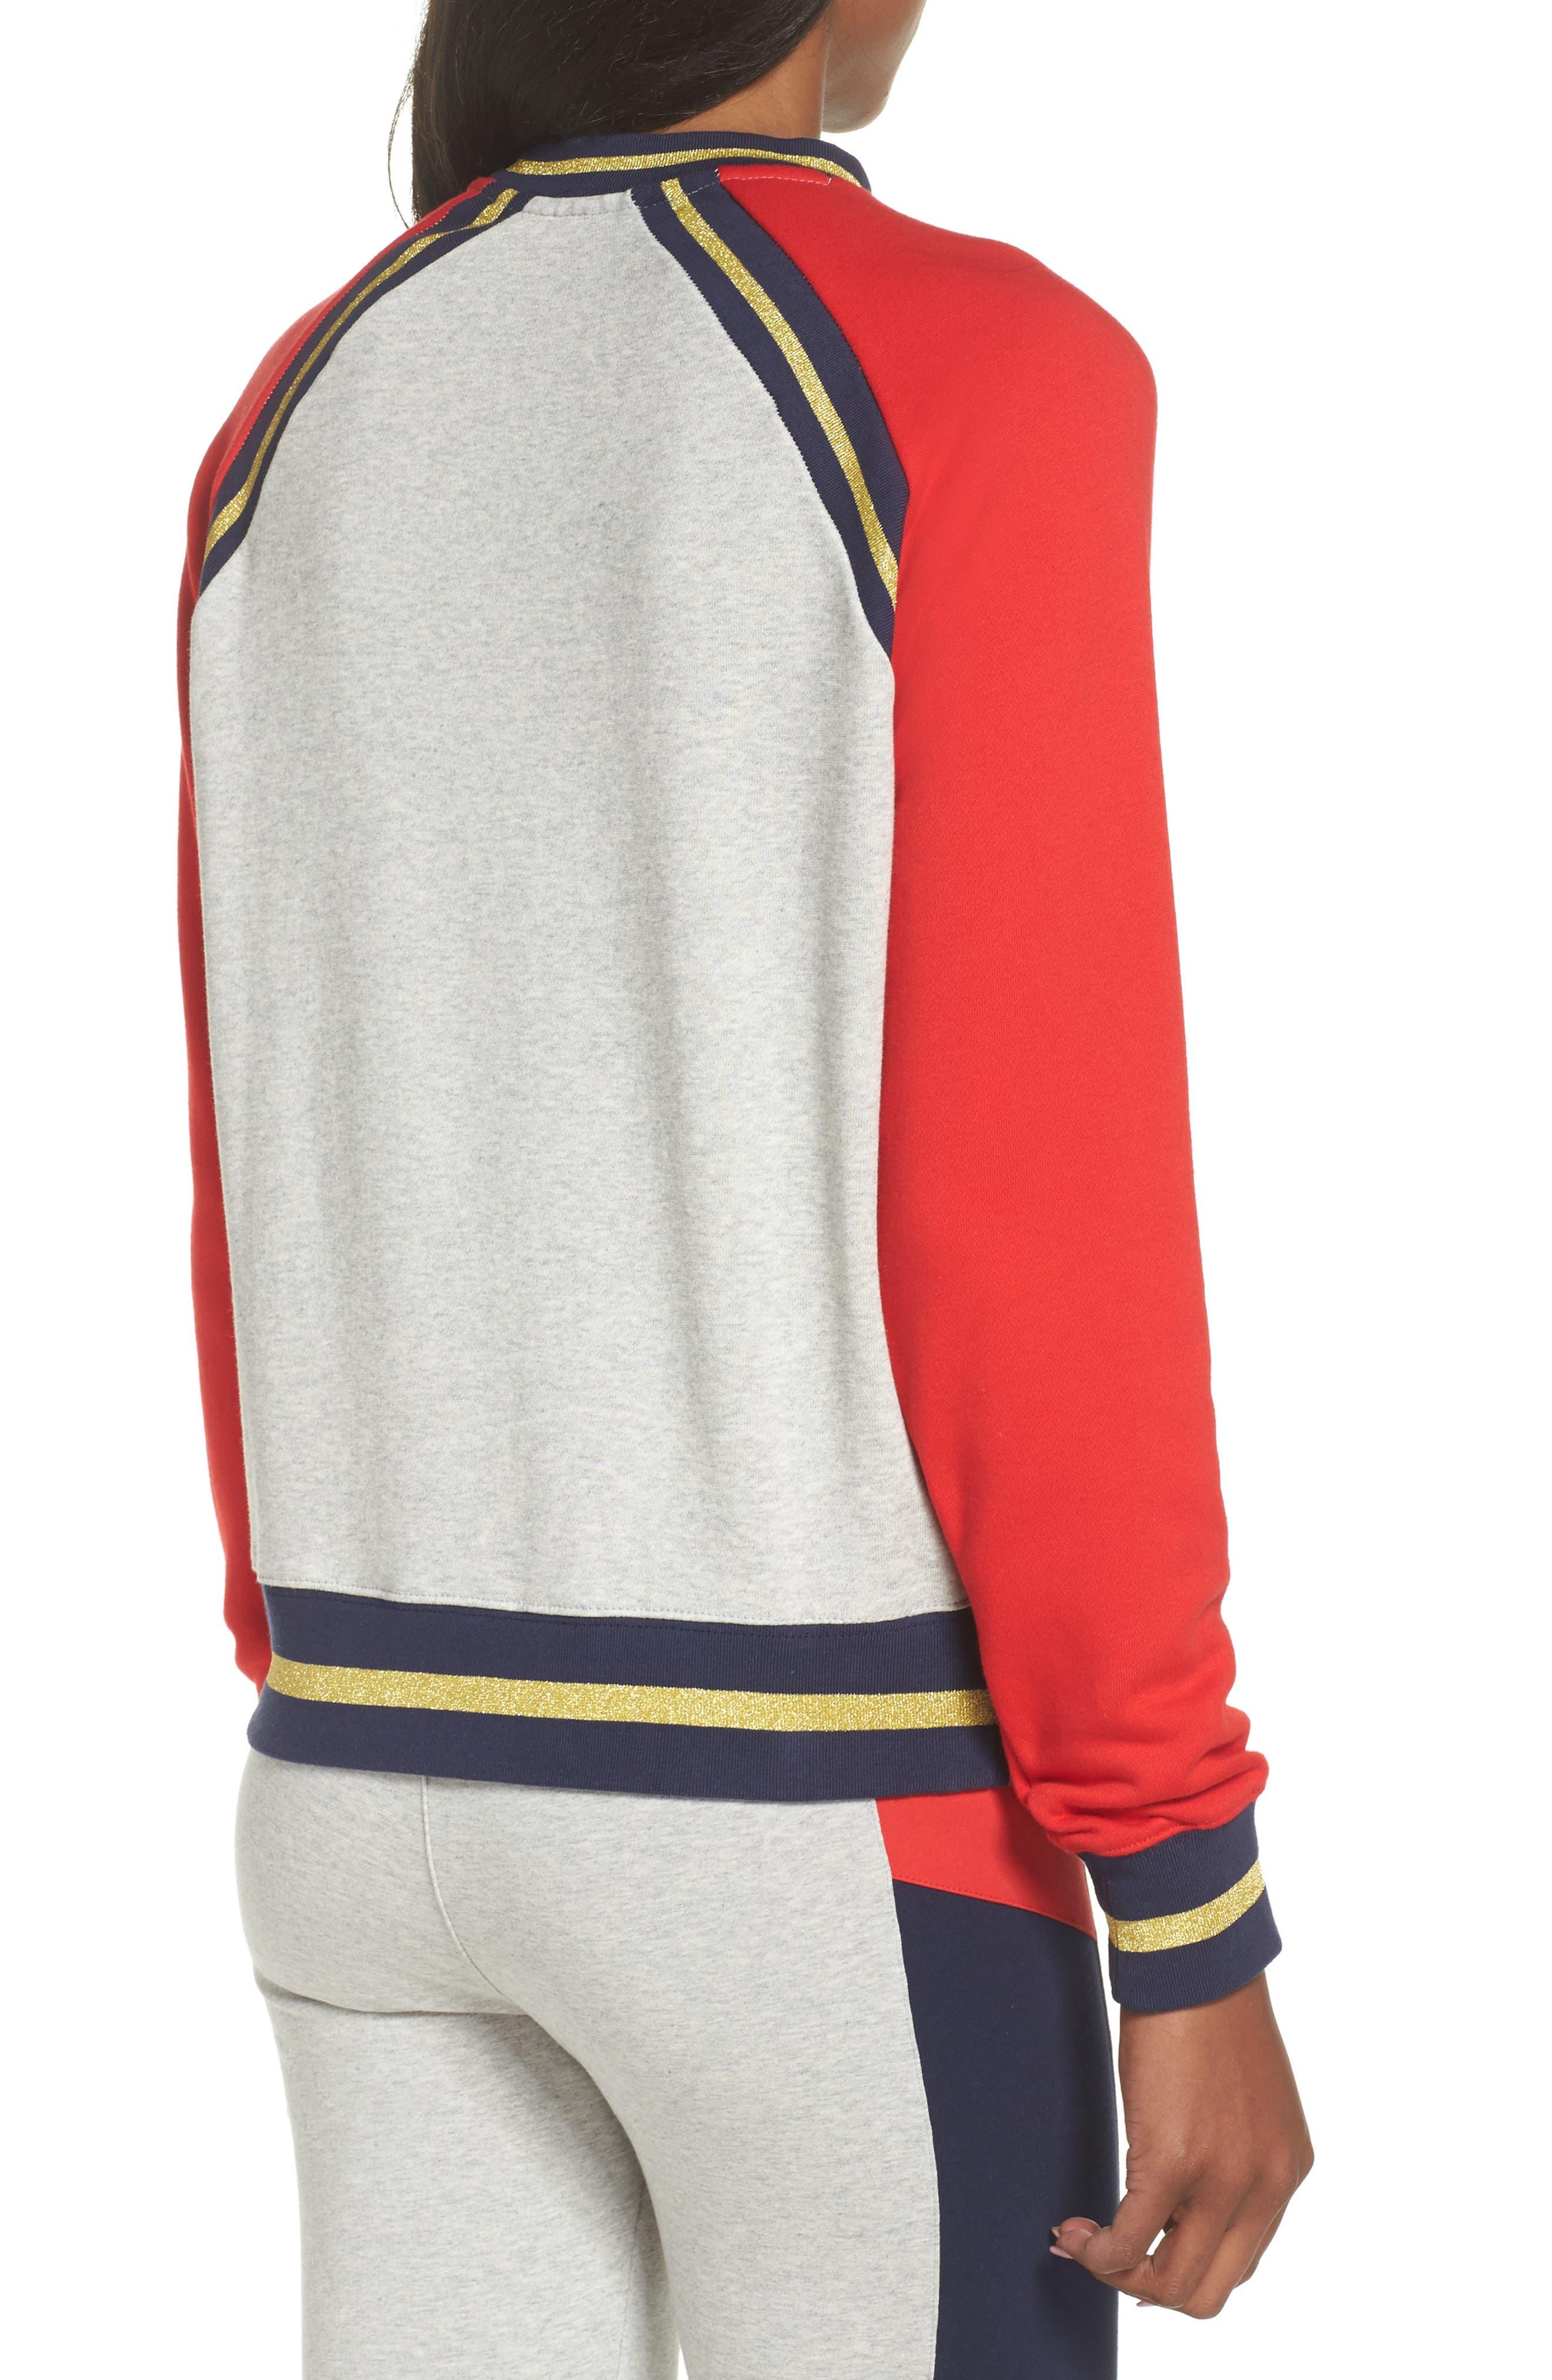 Rafaella Sweatshirt,                             Alternate thumbnail 2, color,                             Light Grey / Peacoat/ Red